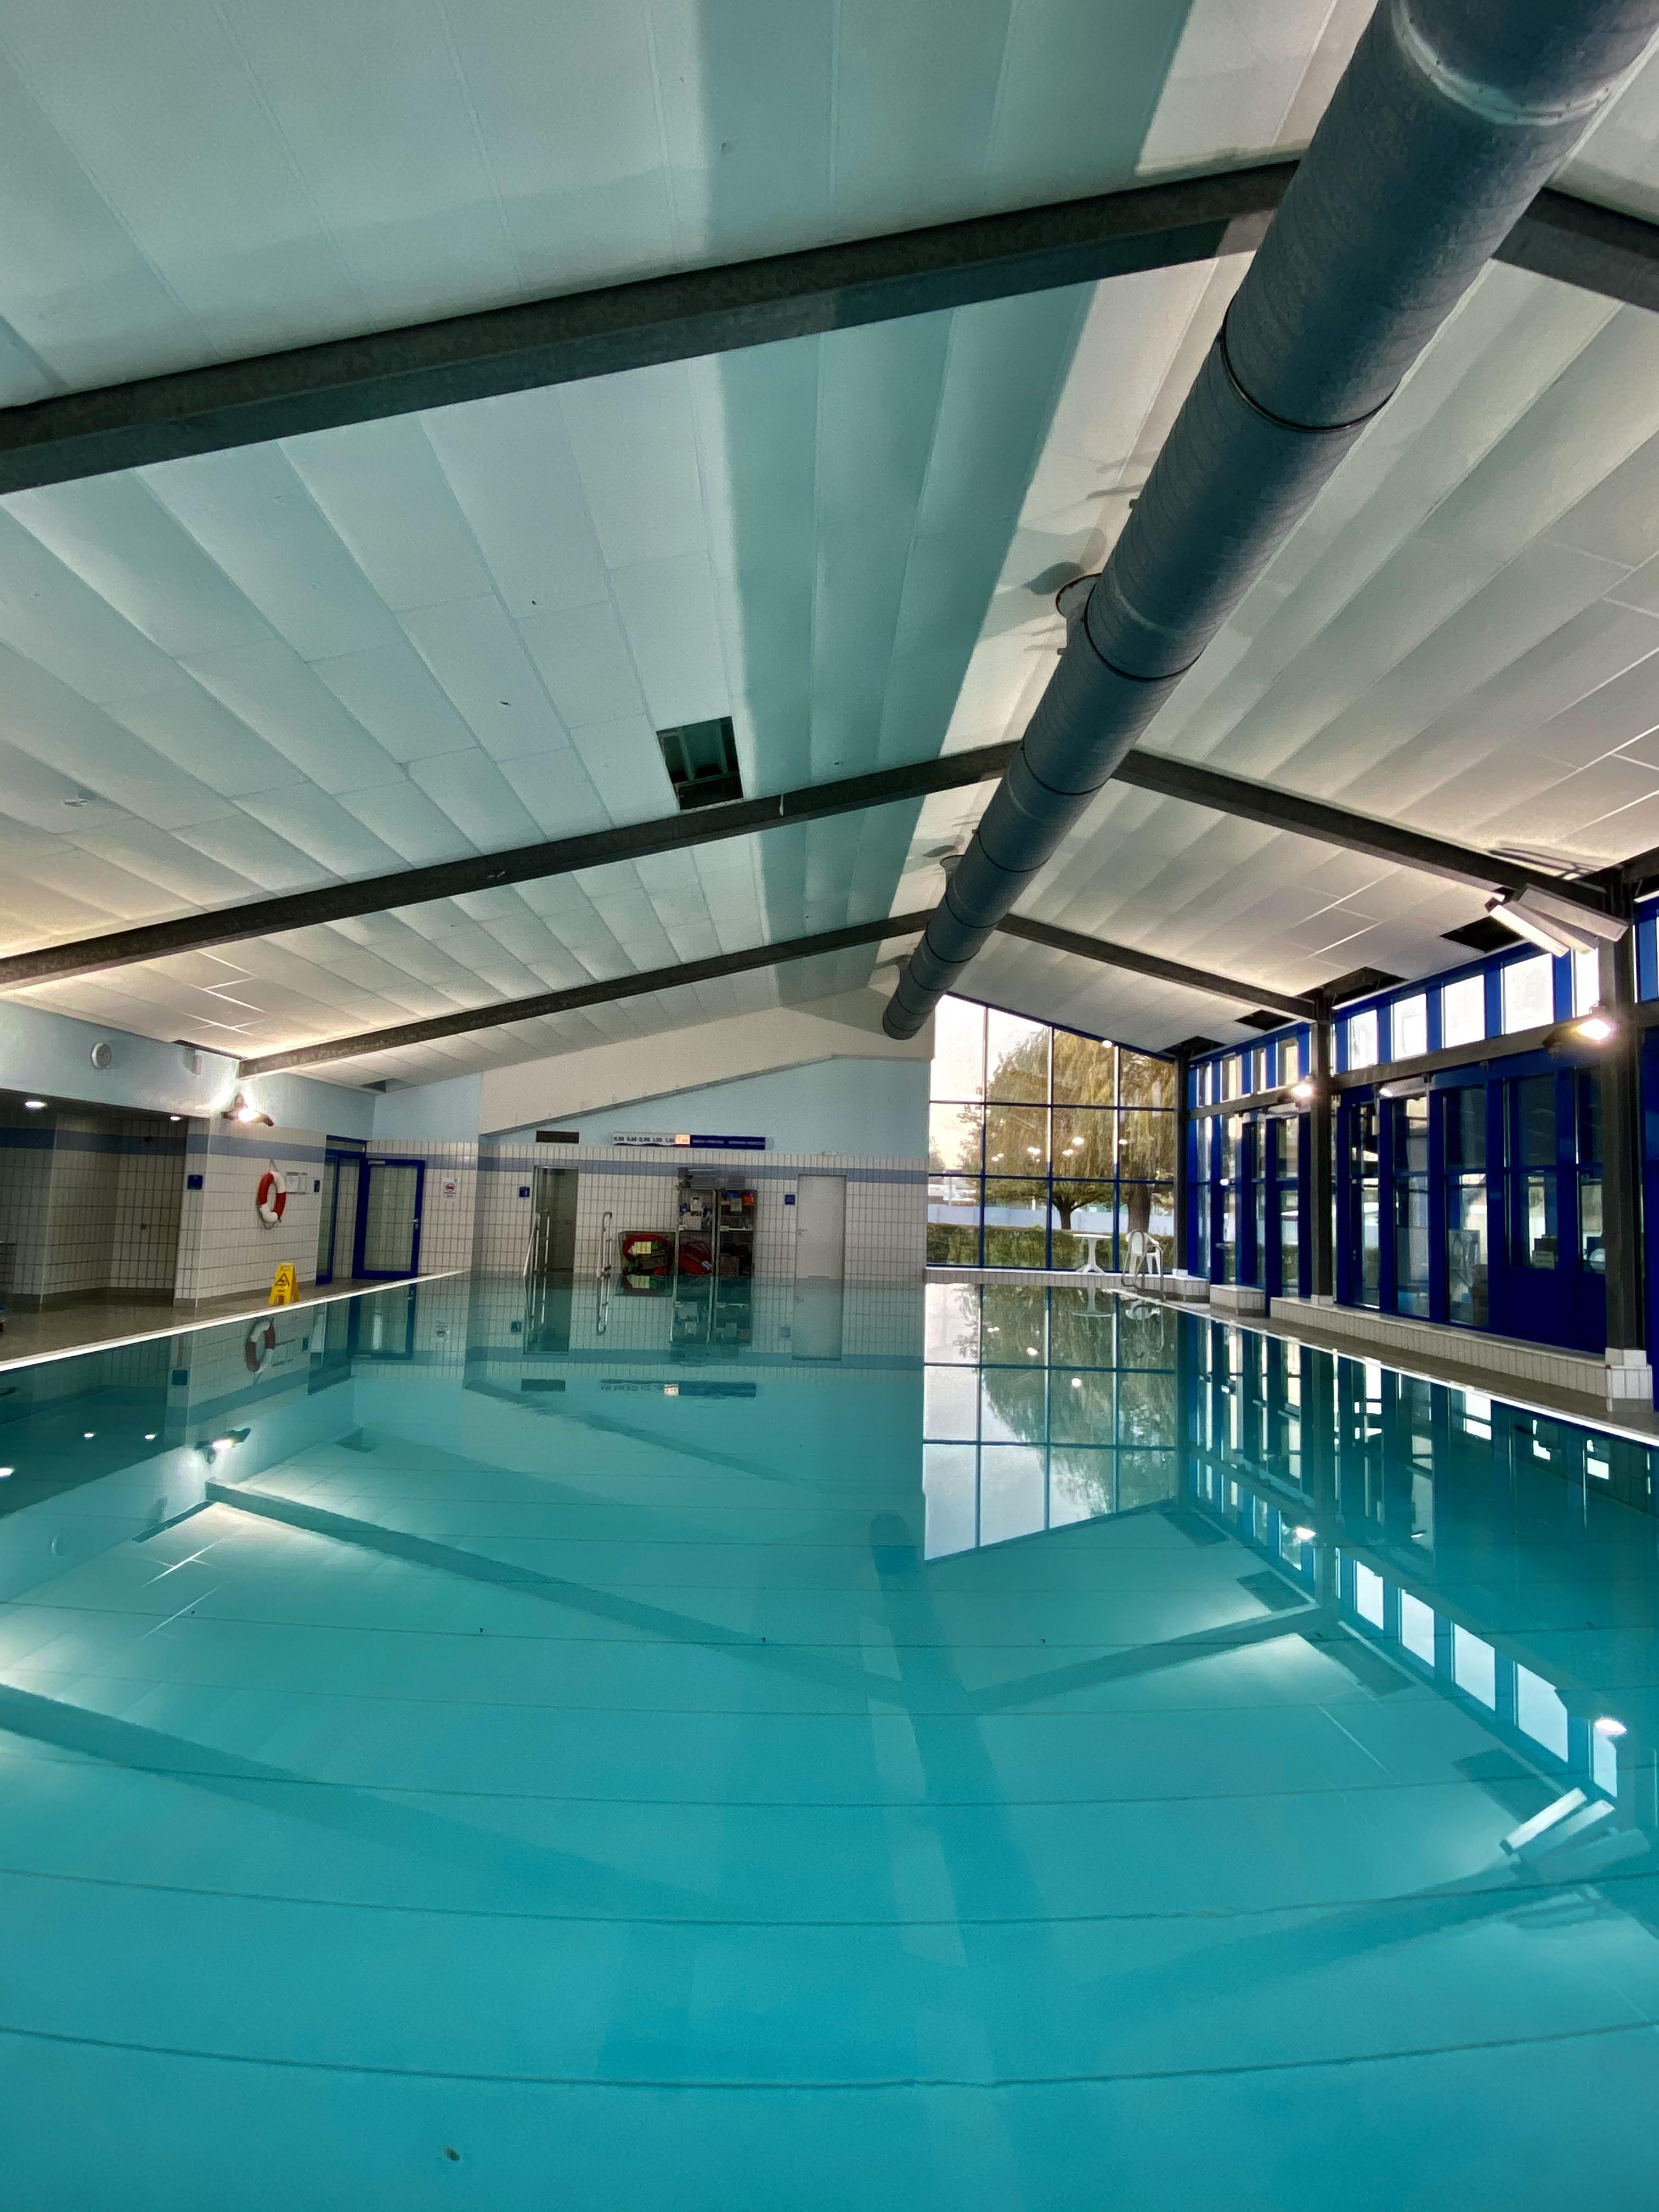 schwimmbad3.jpg